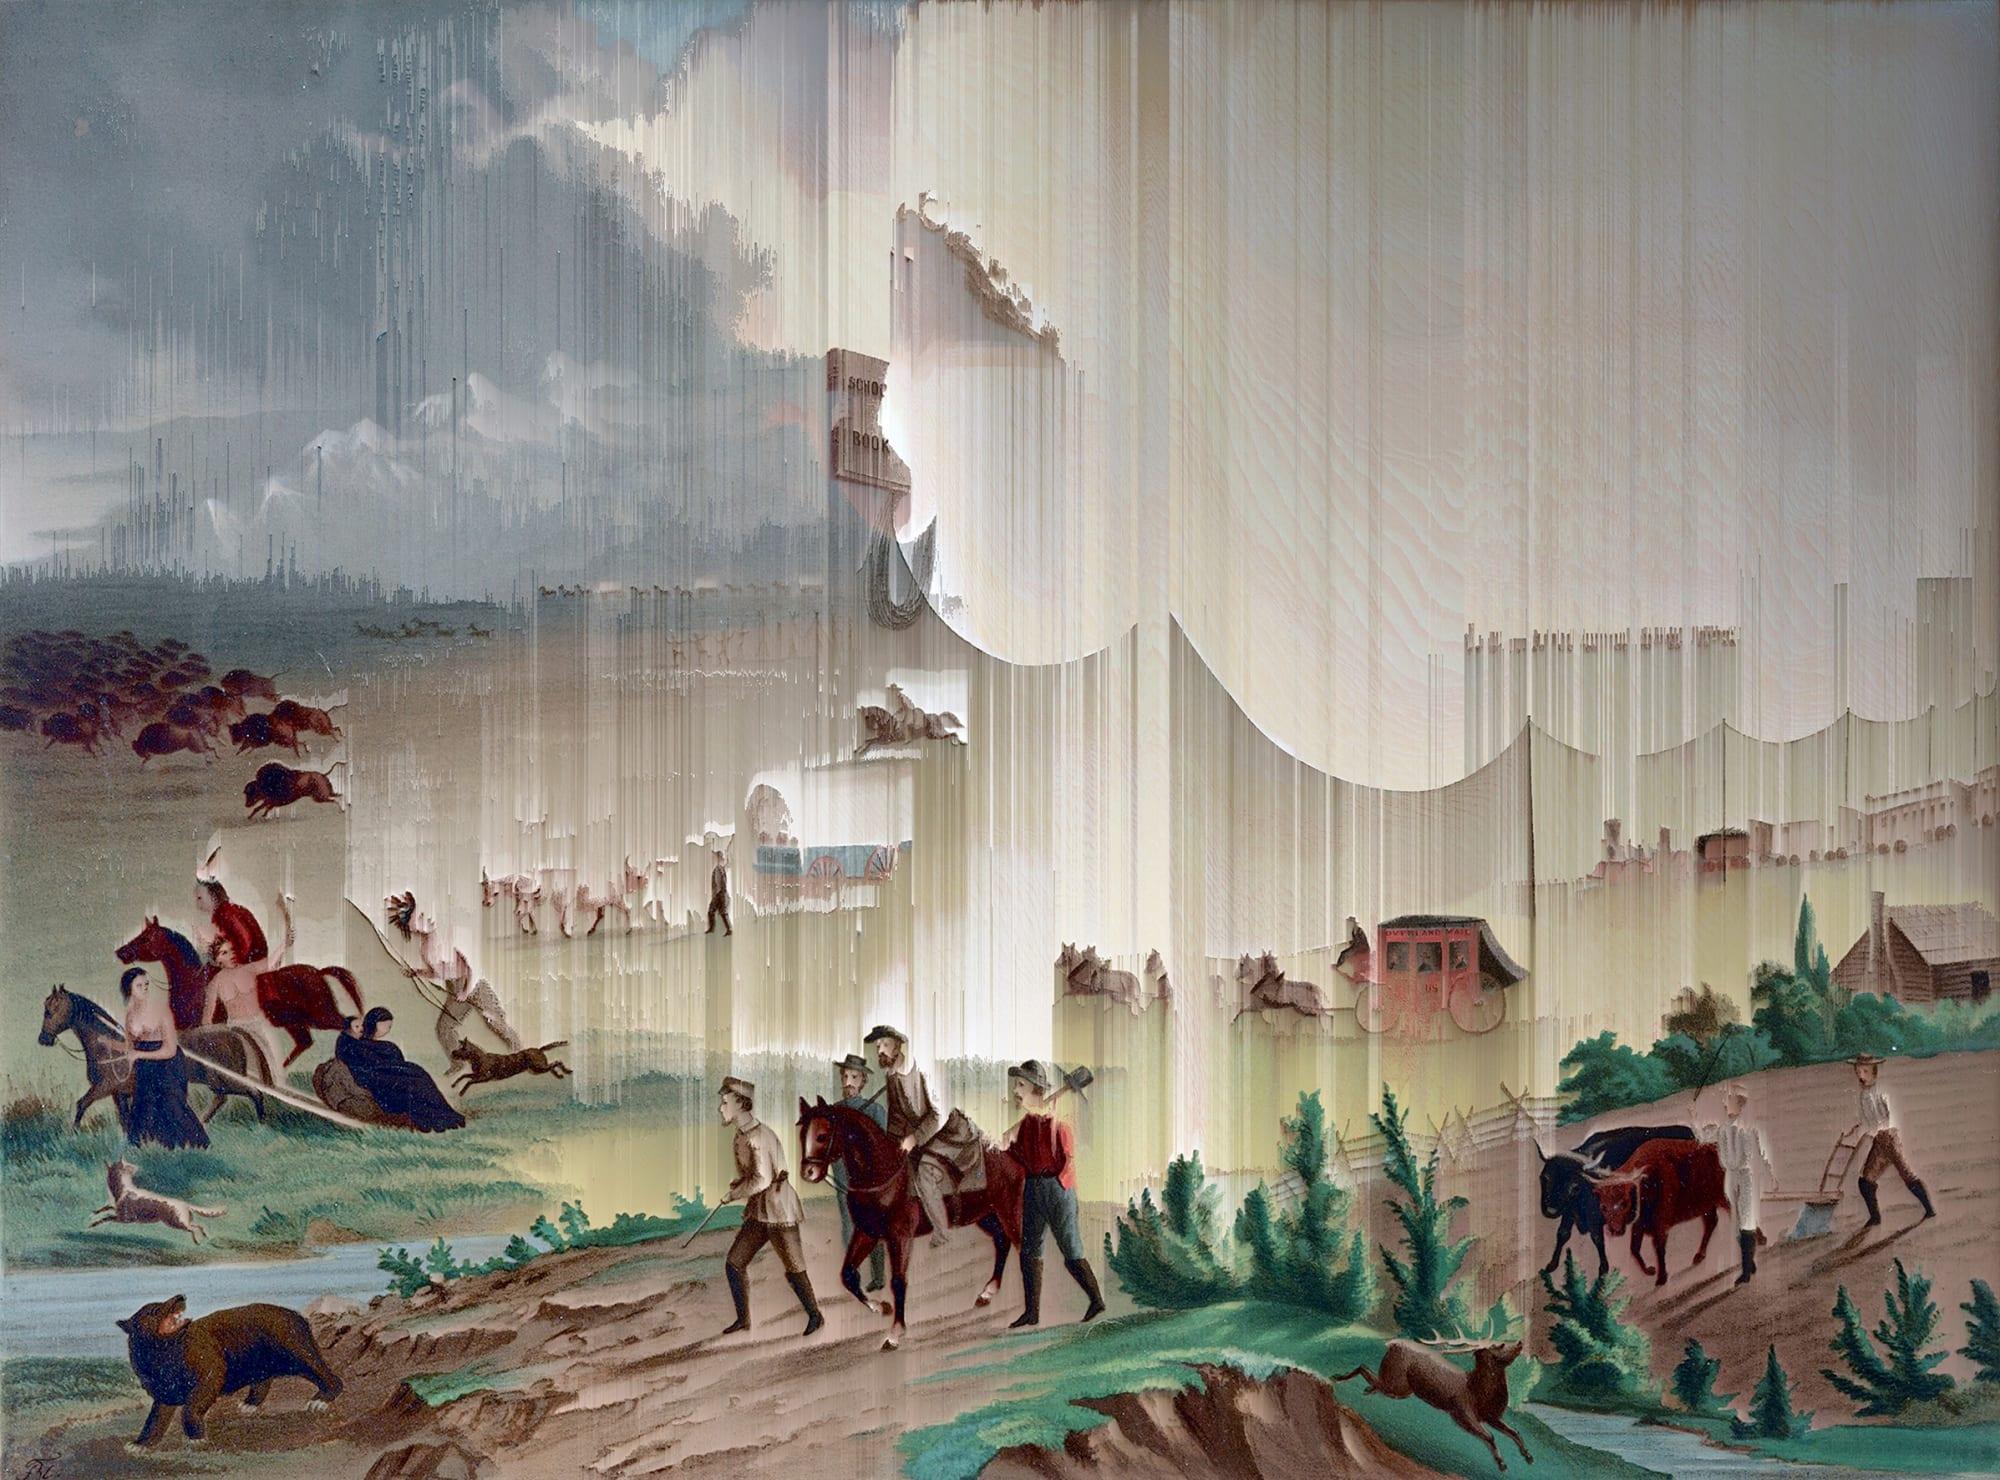 Gordon Cheung, Manifest Destiny, 1872 (after John Gast), 2017